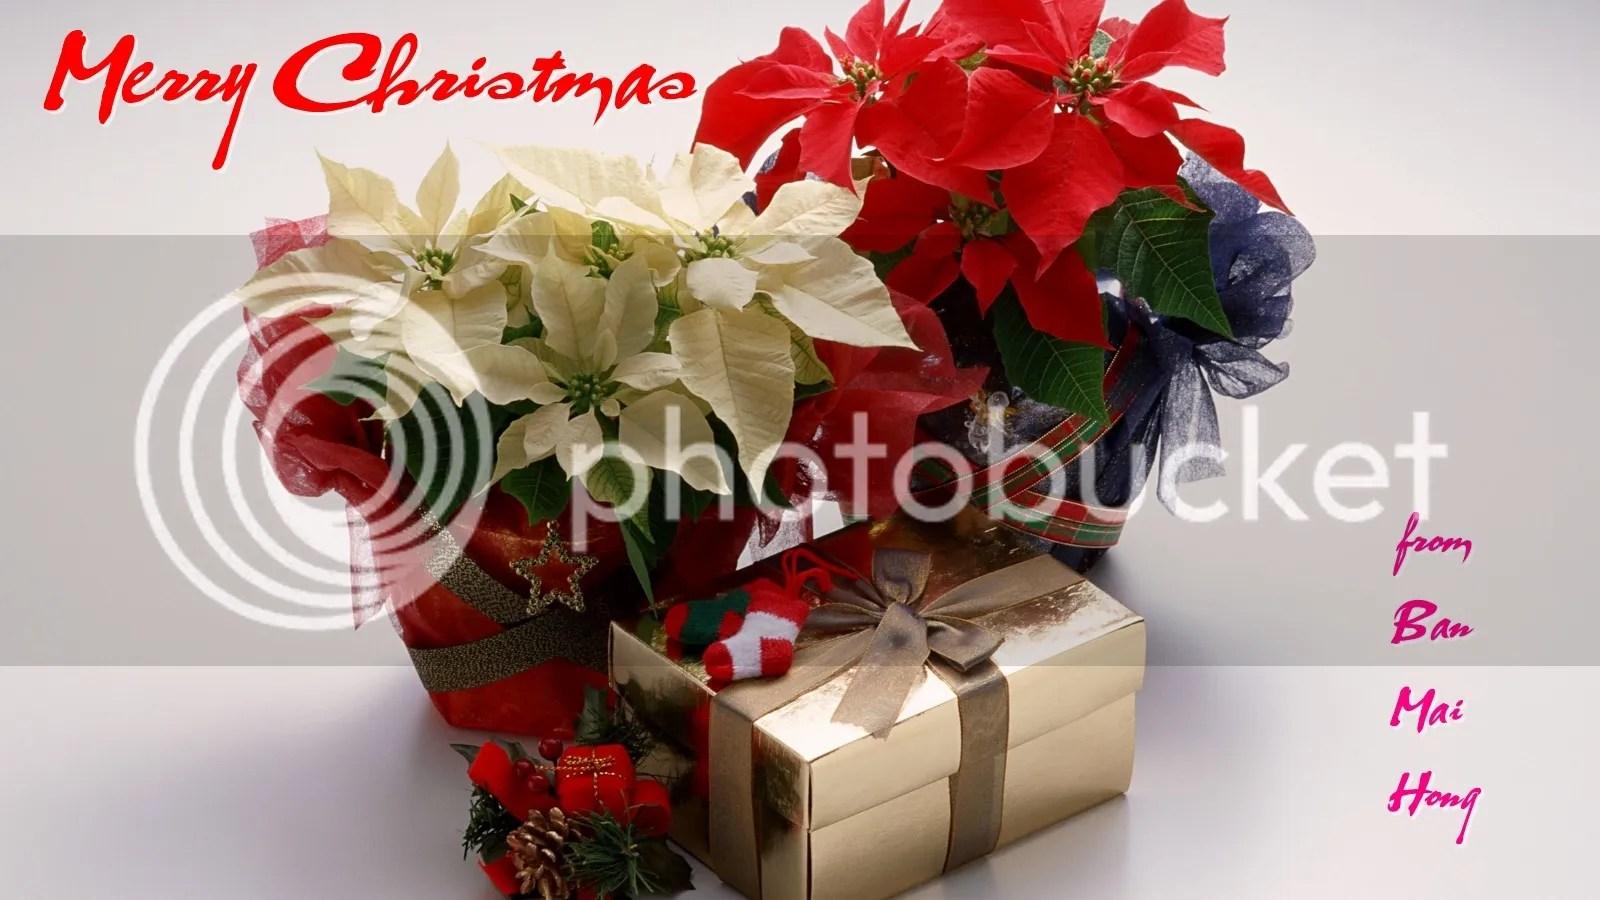 photo Christmas flowers_zps1q8biwqb.jpg